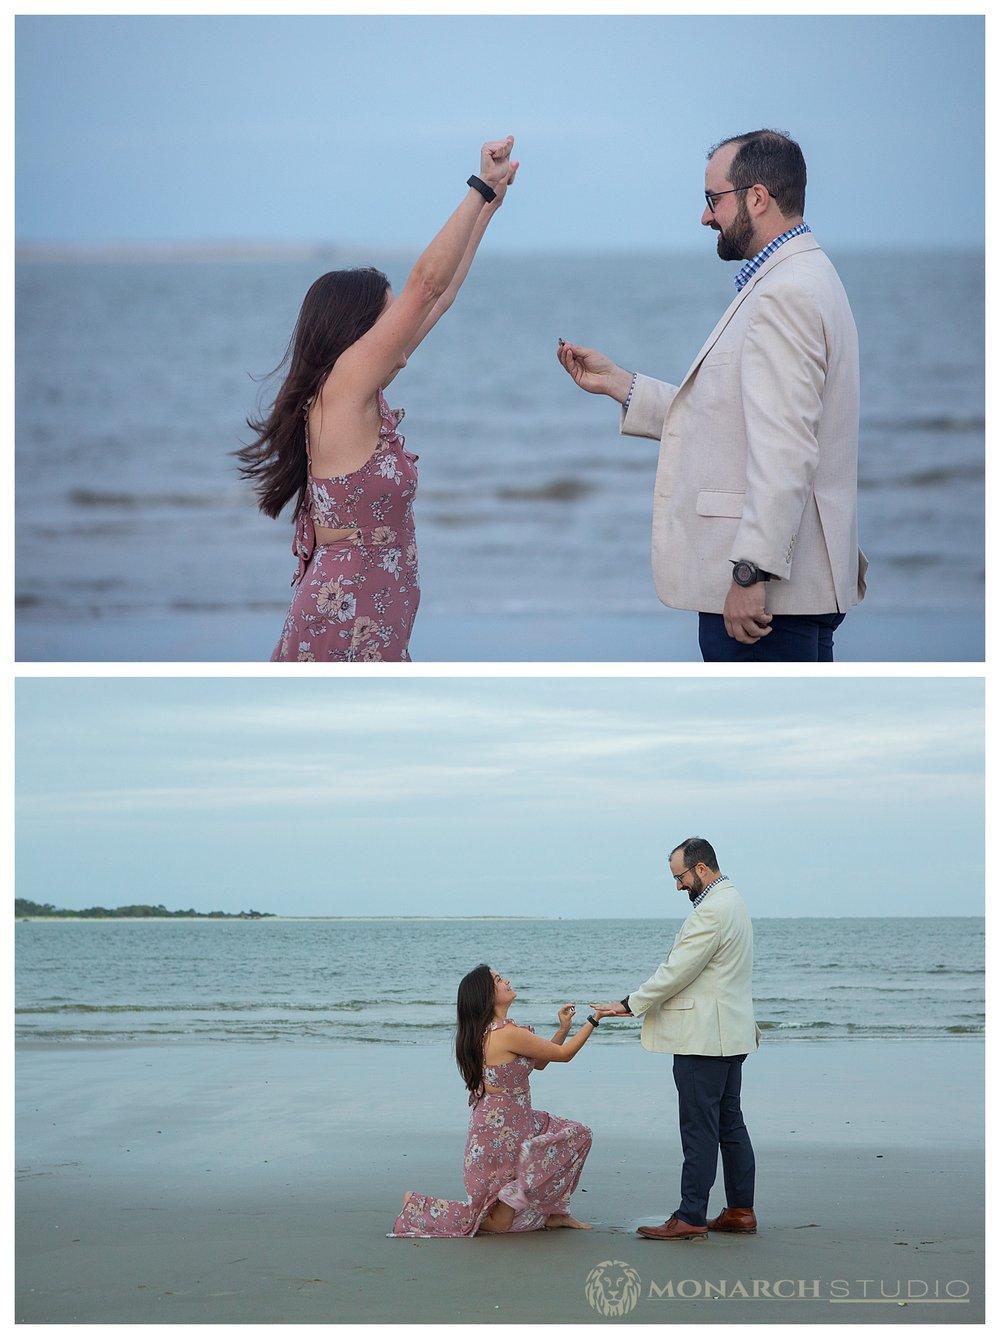 Amelia Island Surprise Proposal Photographer - 008.JPG